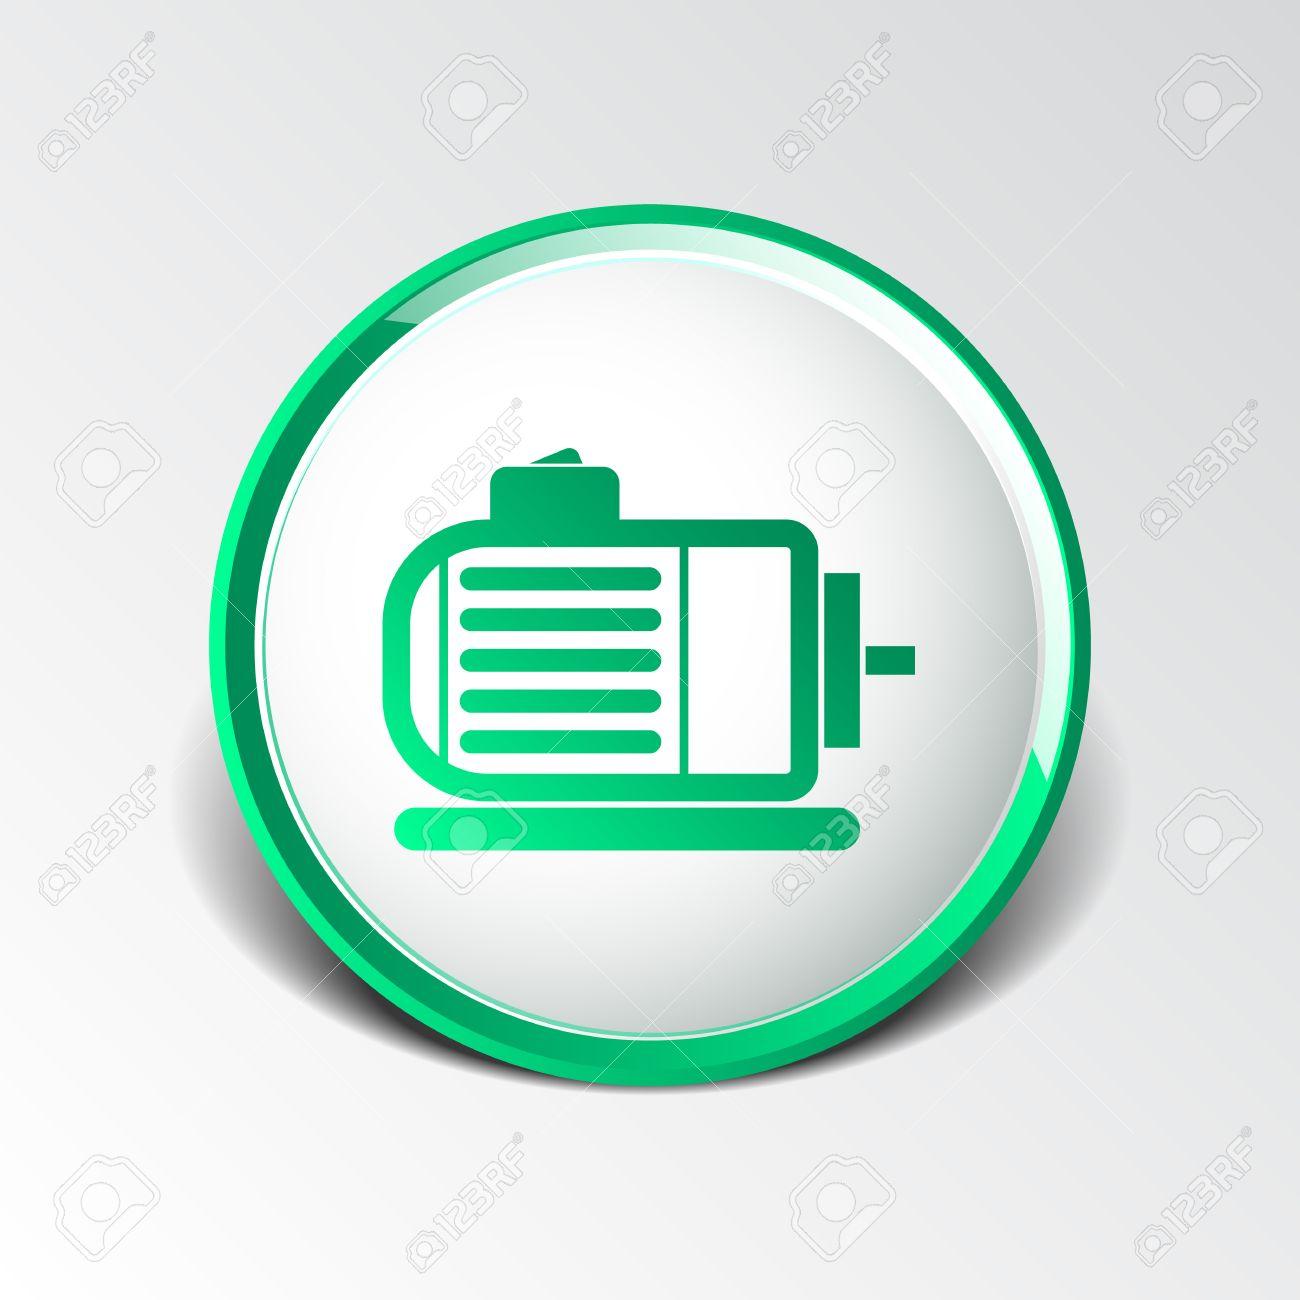 Image Gallery Motor Symbol Relay Schematic Http Proficad Eu Symbols Electrical